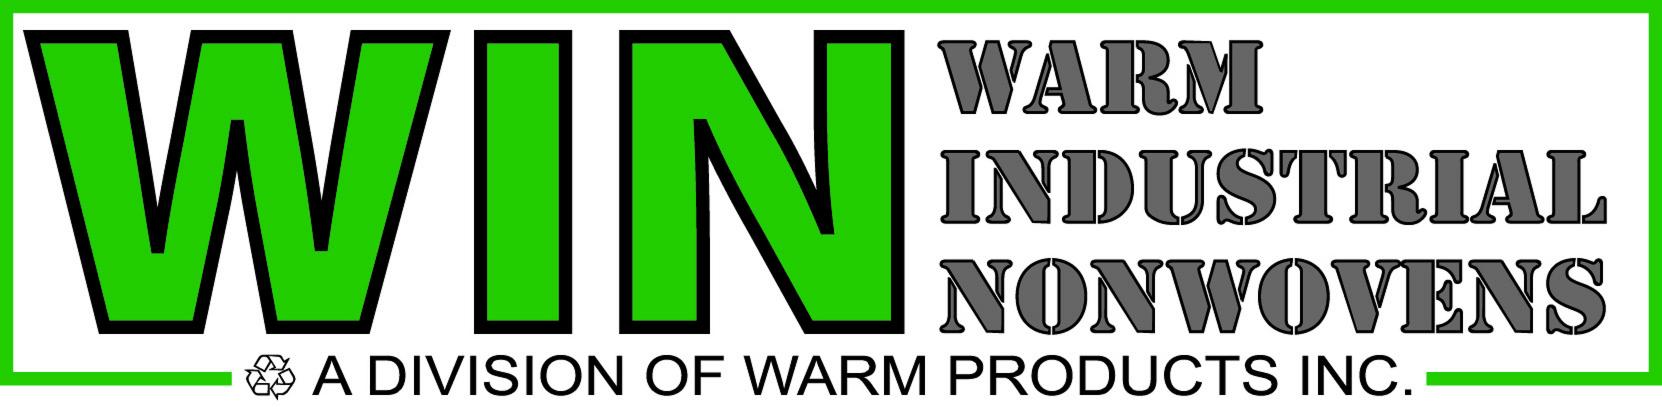 Warm Industrial Nonwovens